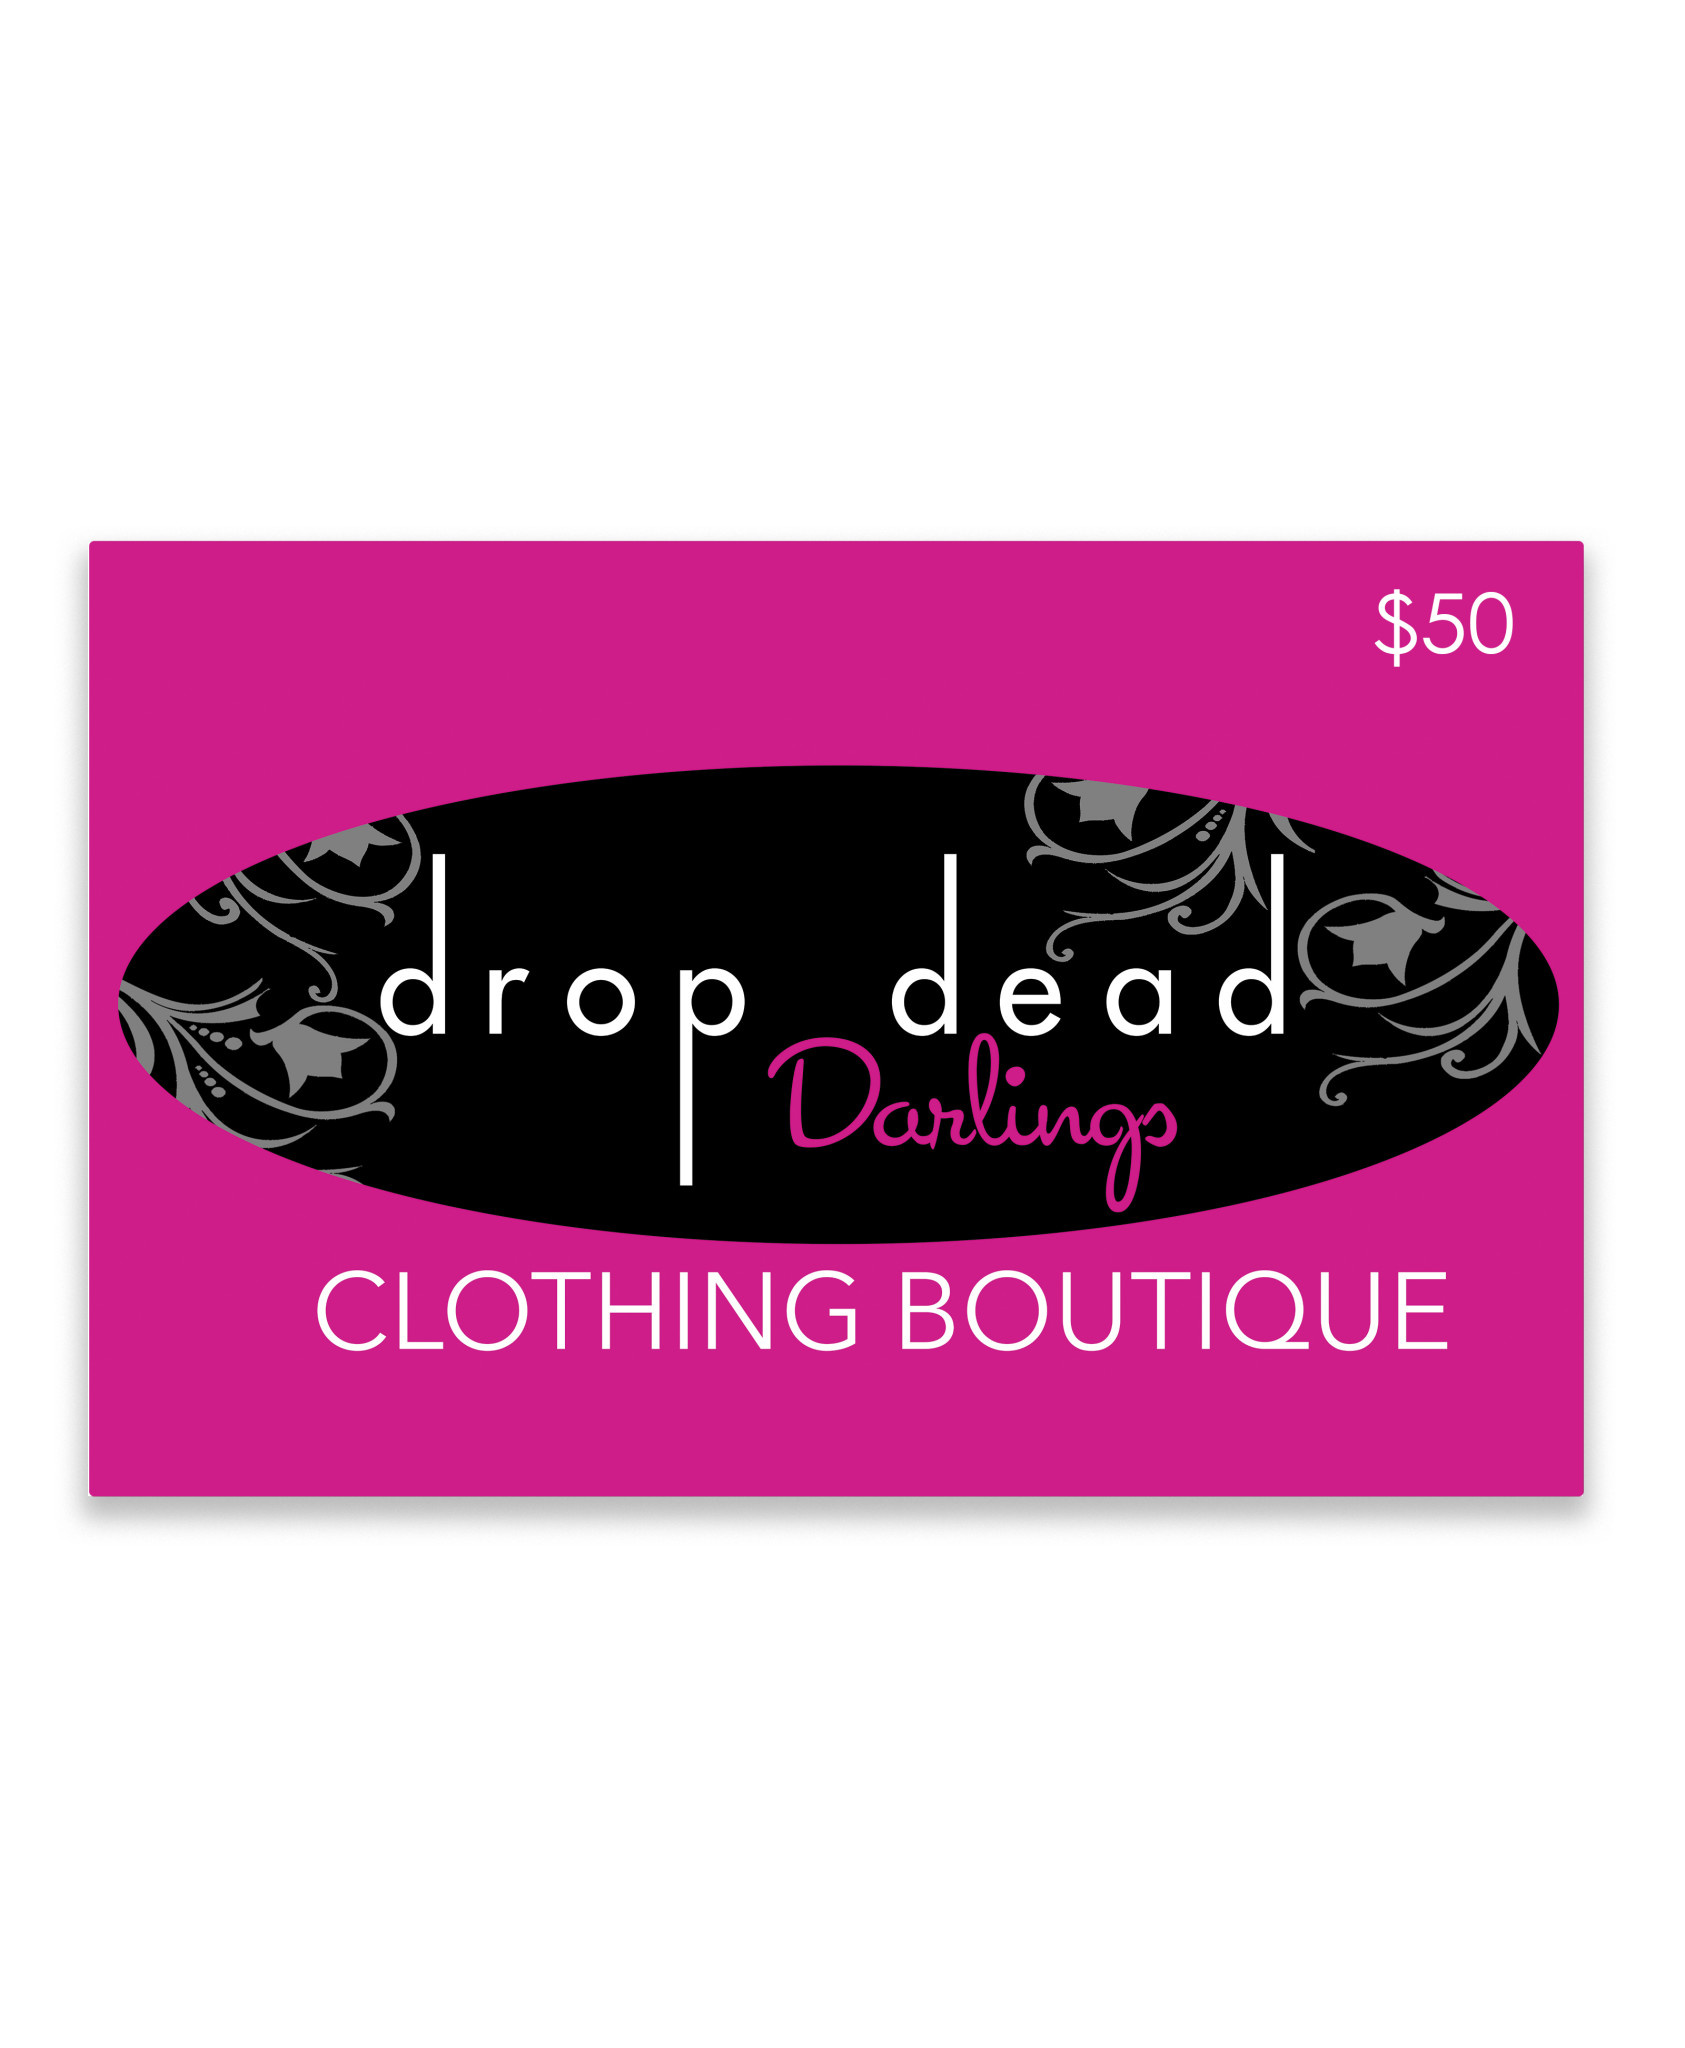 Drop Dead Darlings Gift Card - $50